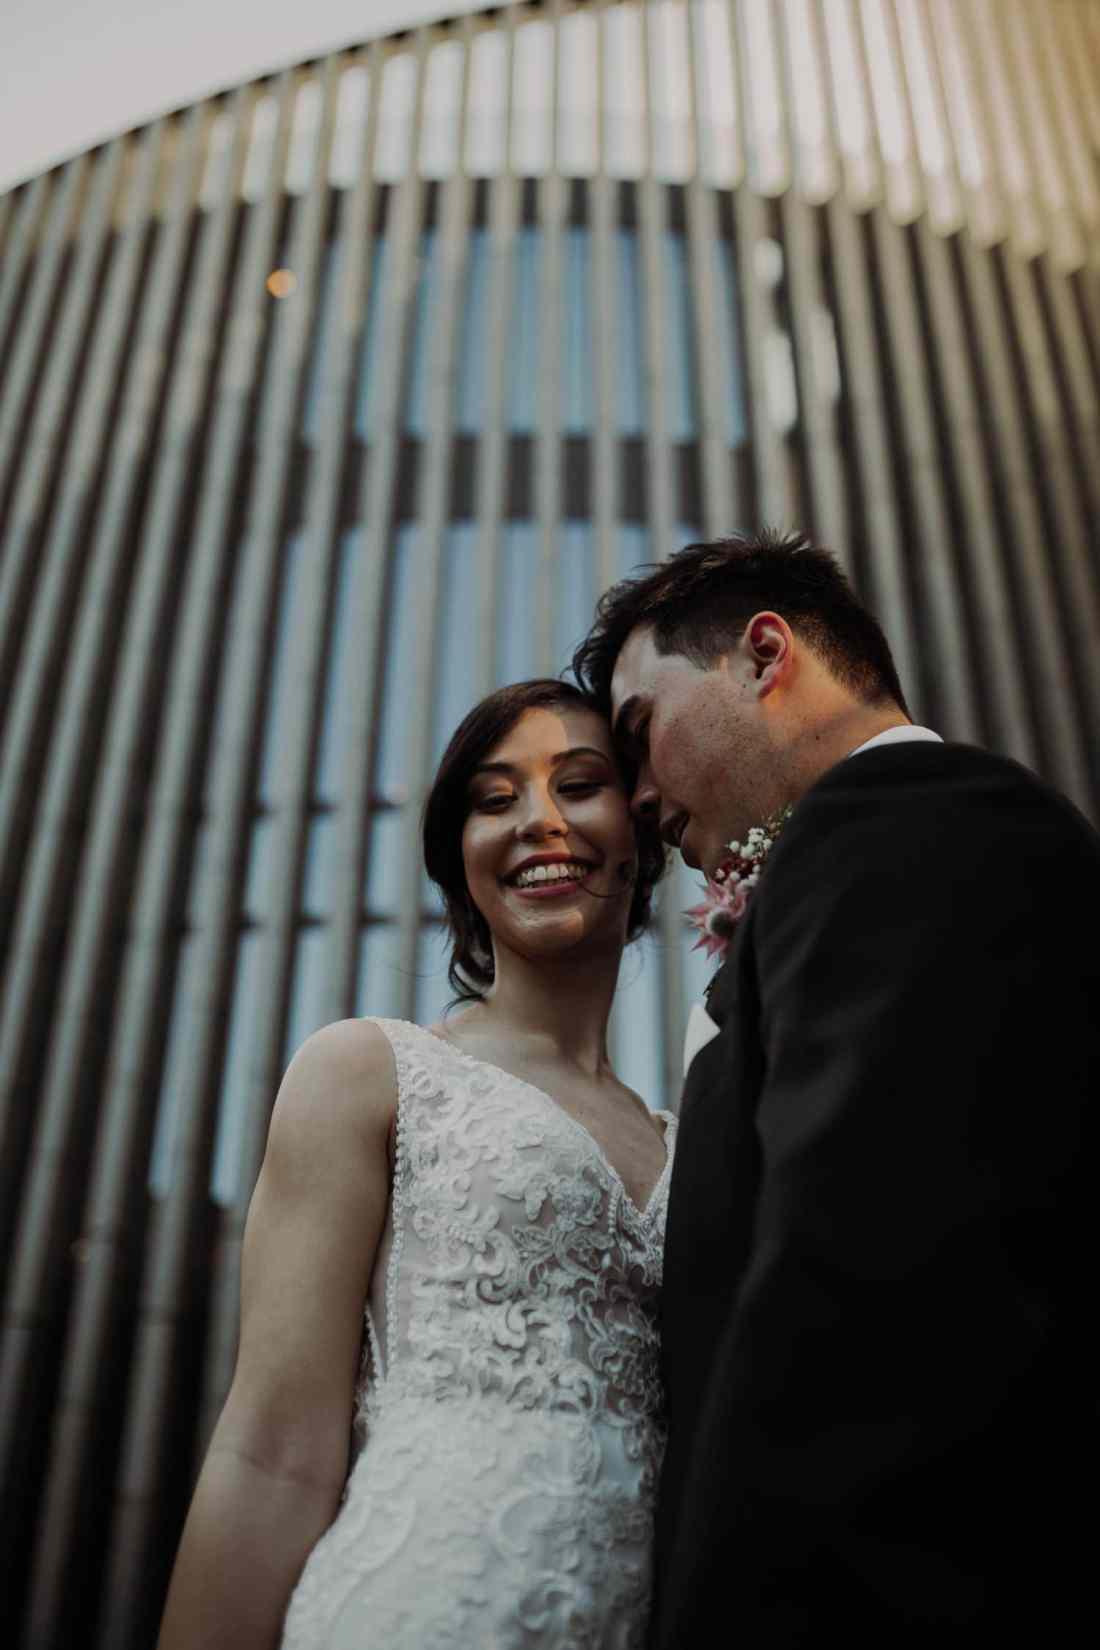 Ebony Blush Photography | Perth Wedding Photographer | Photography + Film | Sandalford Winery | Como Treasury Wedding | Perth City Wedding |Alex + Mel82